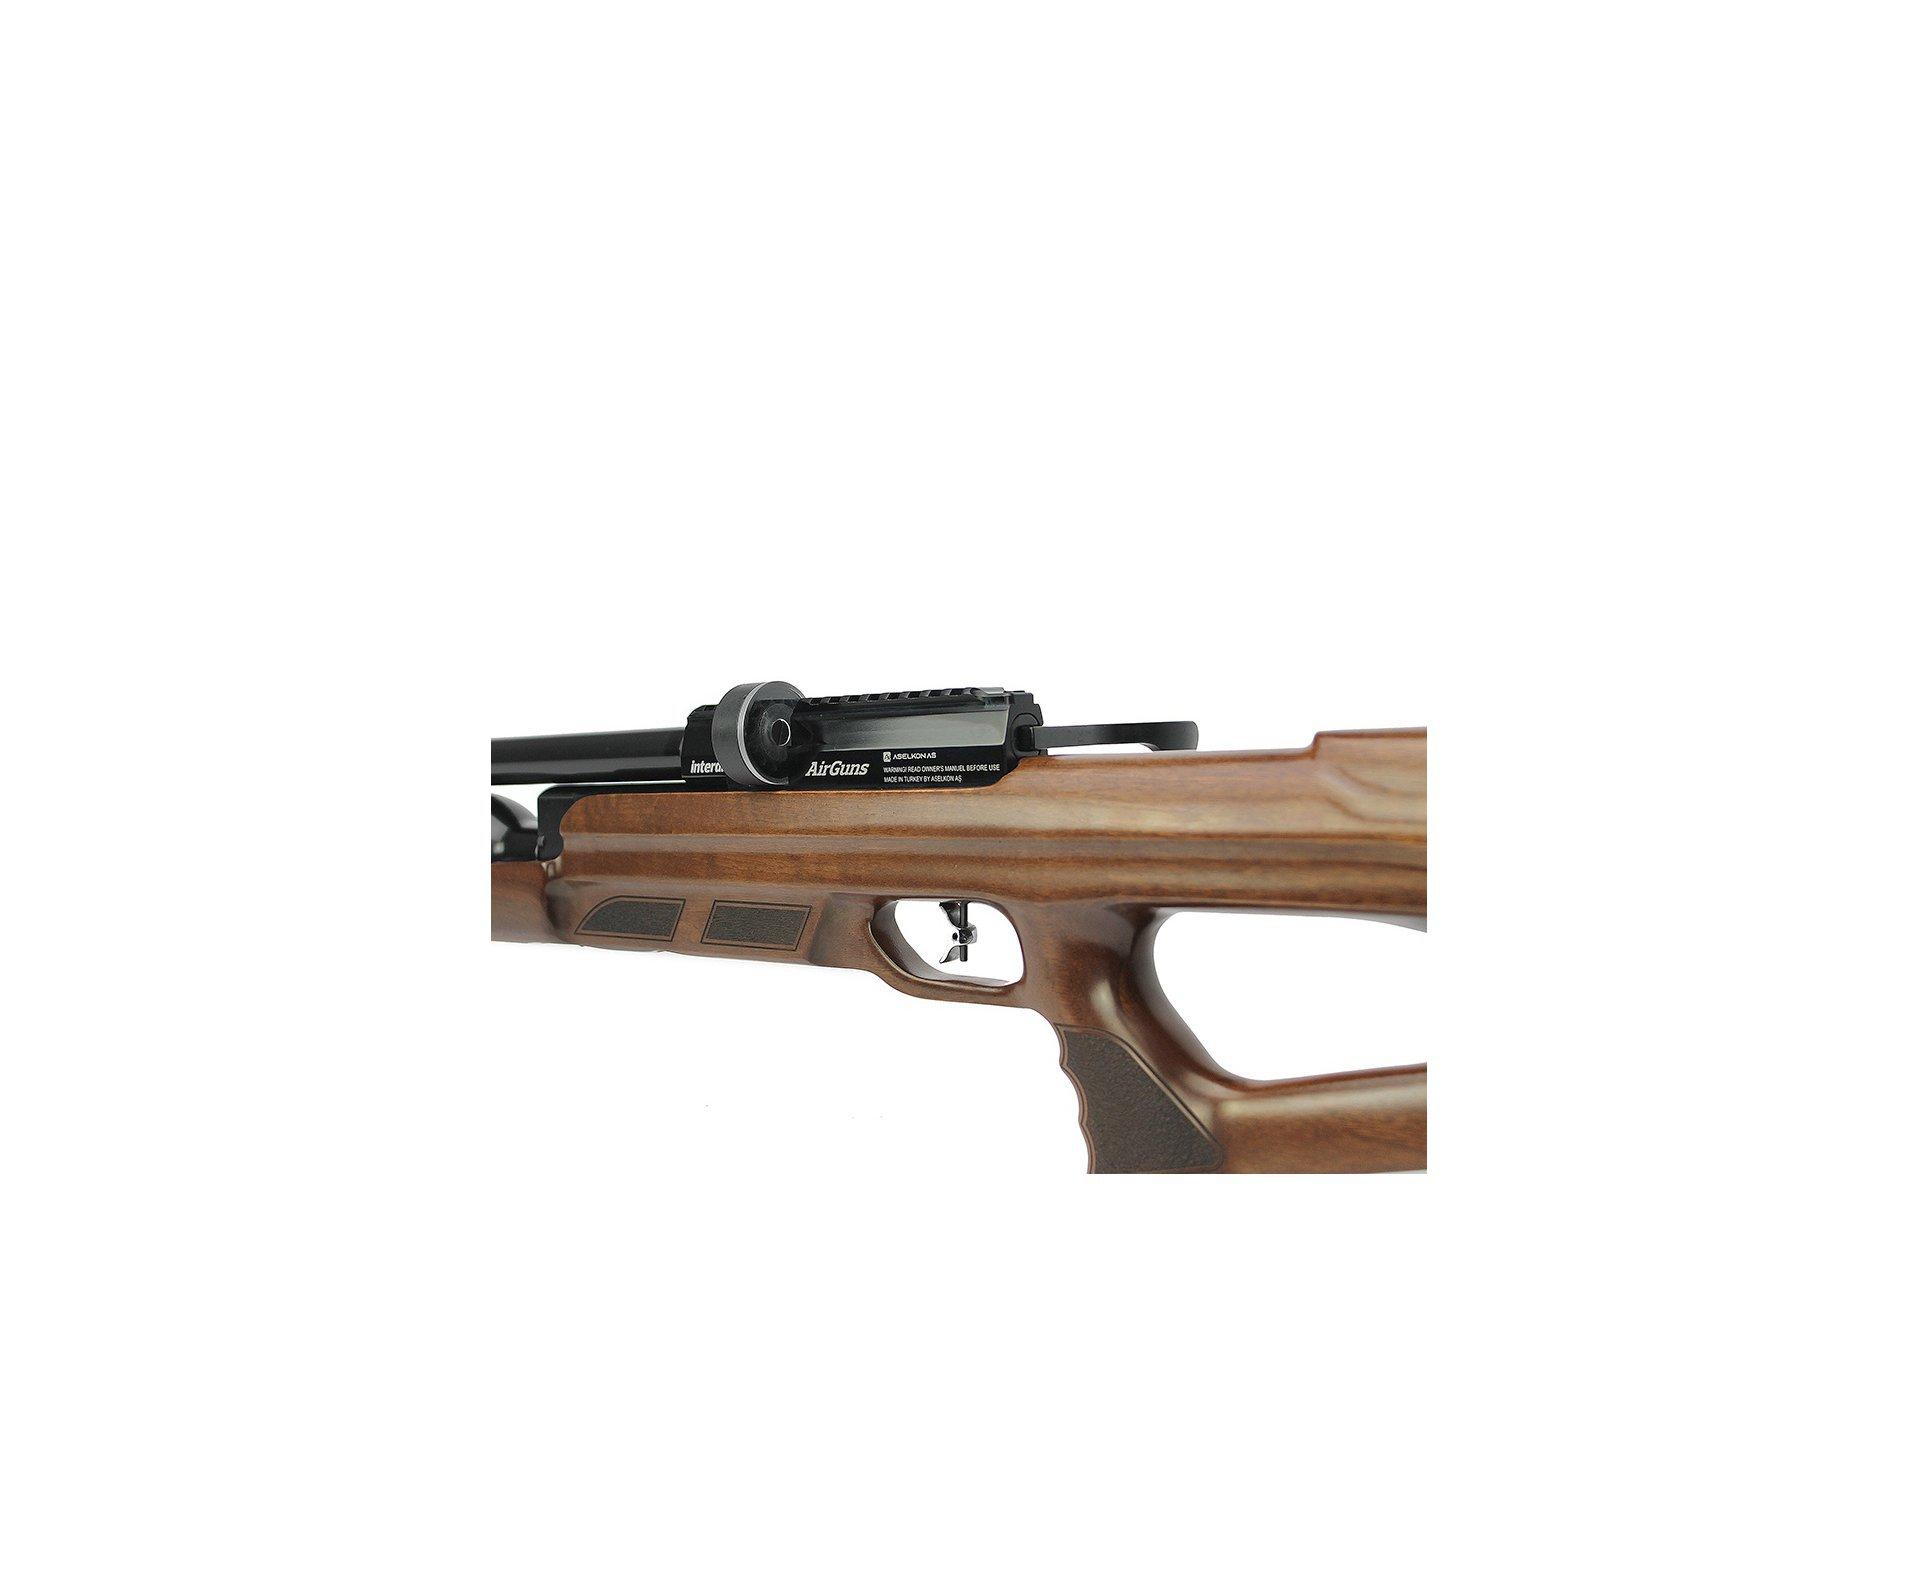 Artefato de Pressão PCP MX9 Sniper Wood Regulated 5.5mm Aselkon